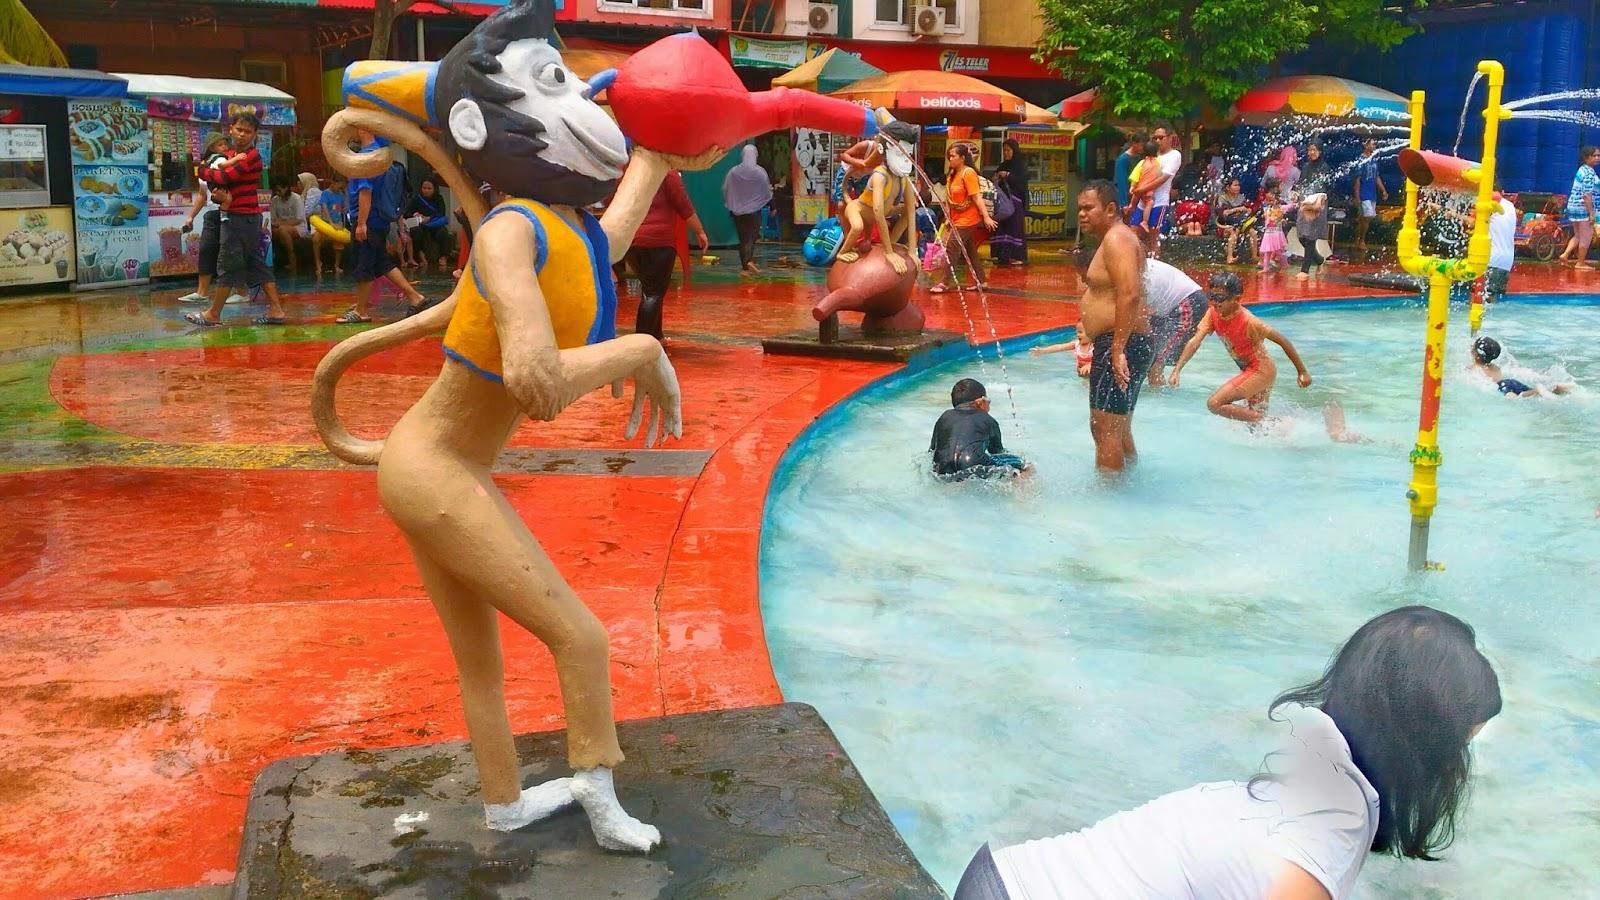 Wahana air Aladin hasil foto Zenfone 2 laser